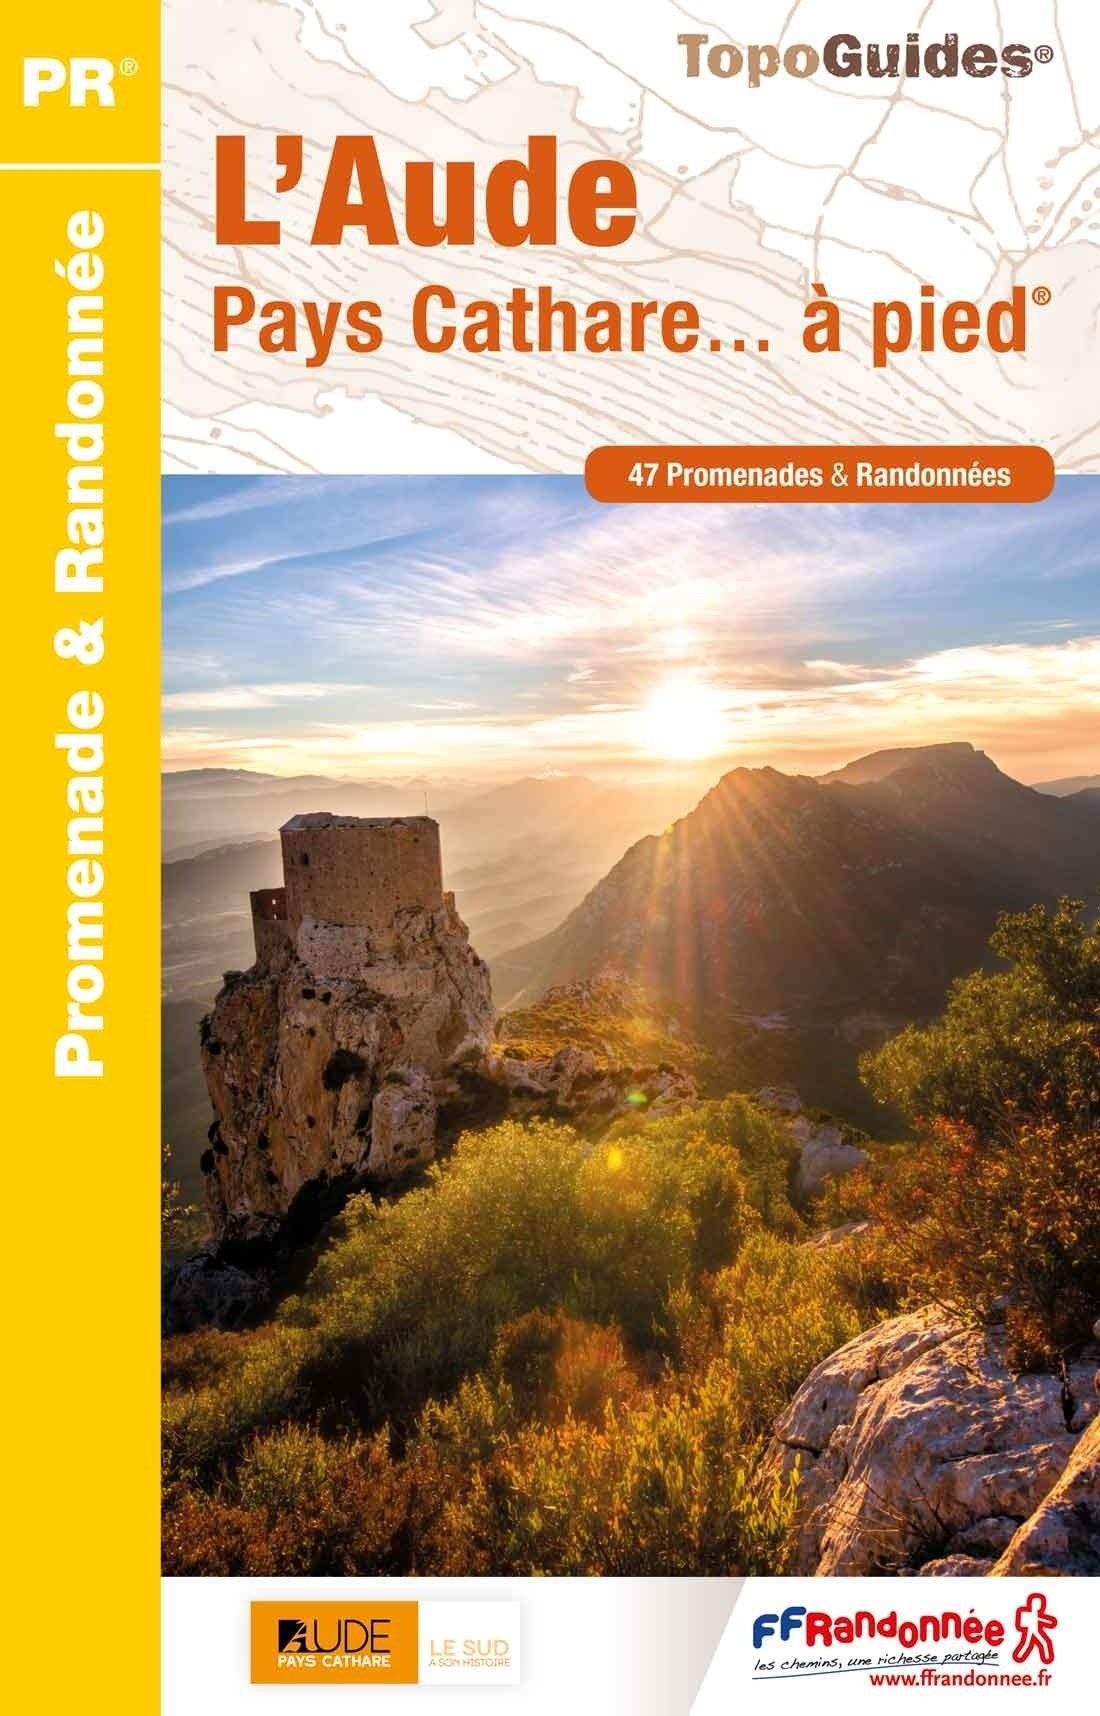 D011  l'Aude Pays Cathare... à pied 9782751410239  FFRP Topoguides  Wandelgidsen Franse Pyreneeën, Toulouse, Gers, Garonne, Languedoc, Hérault, Aude, Tarn